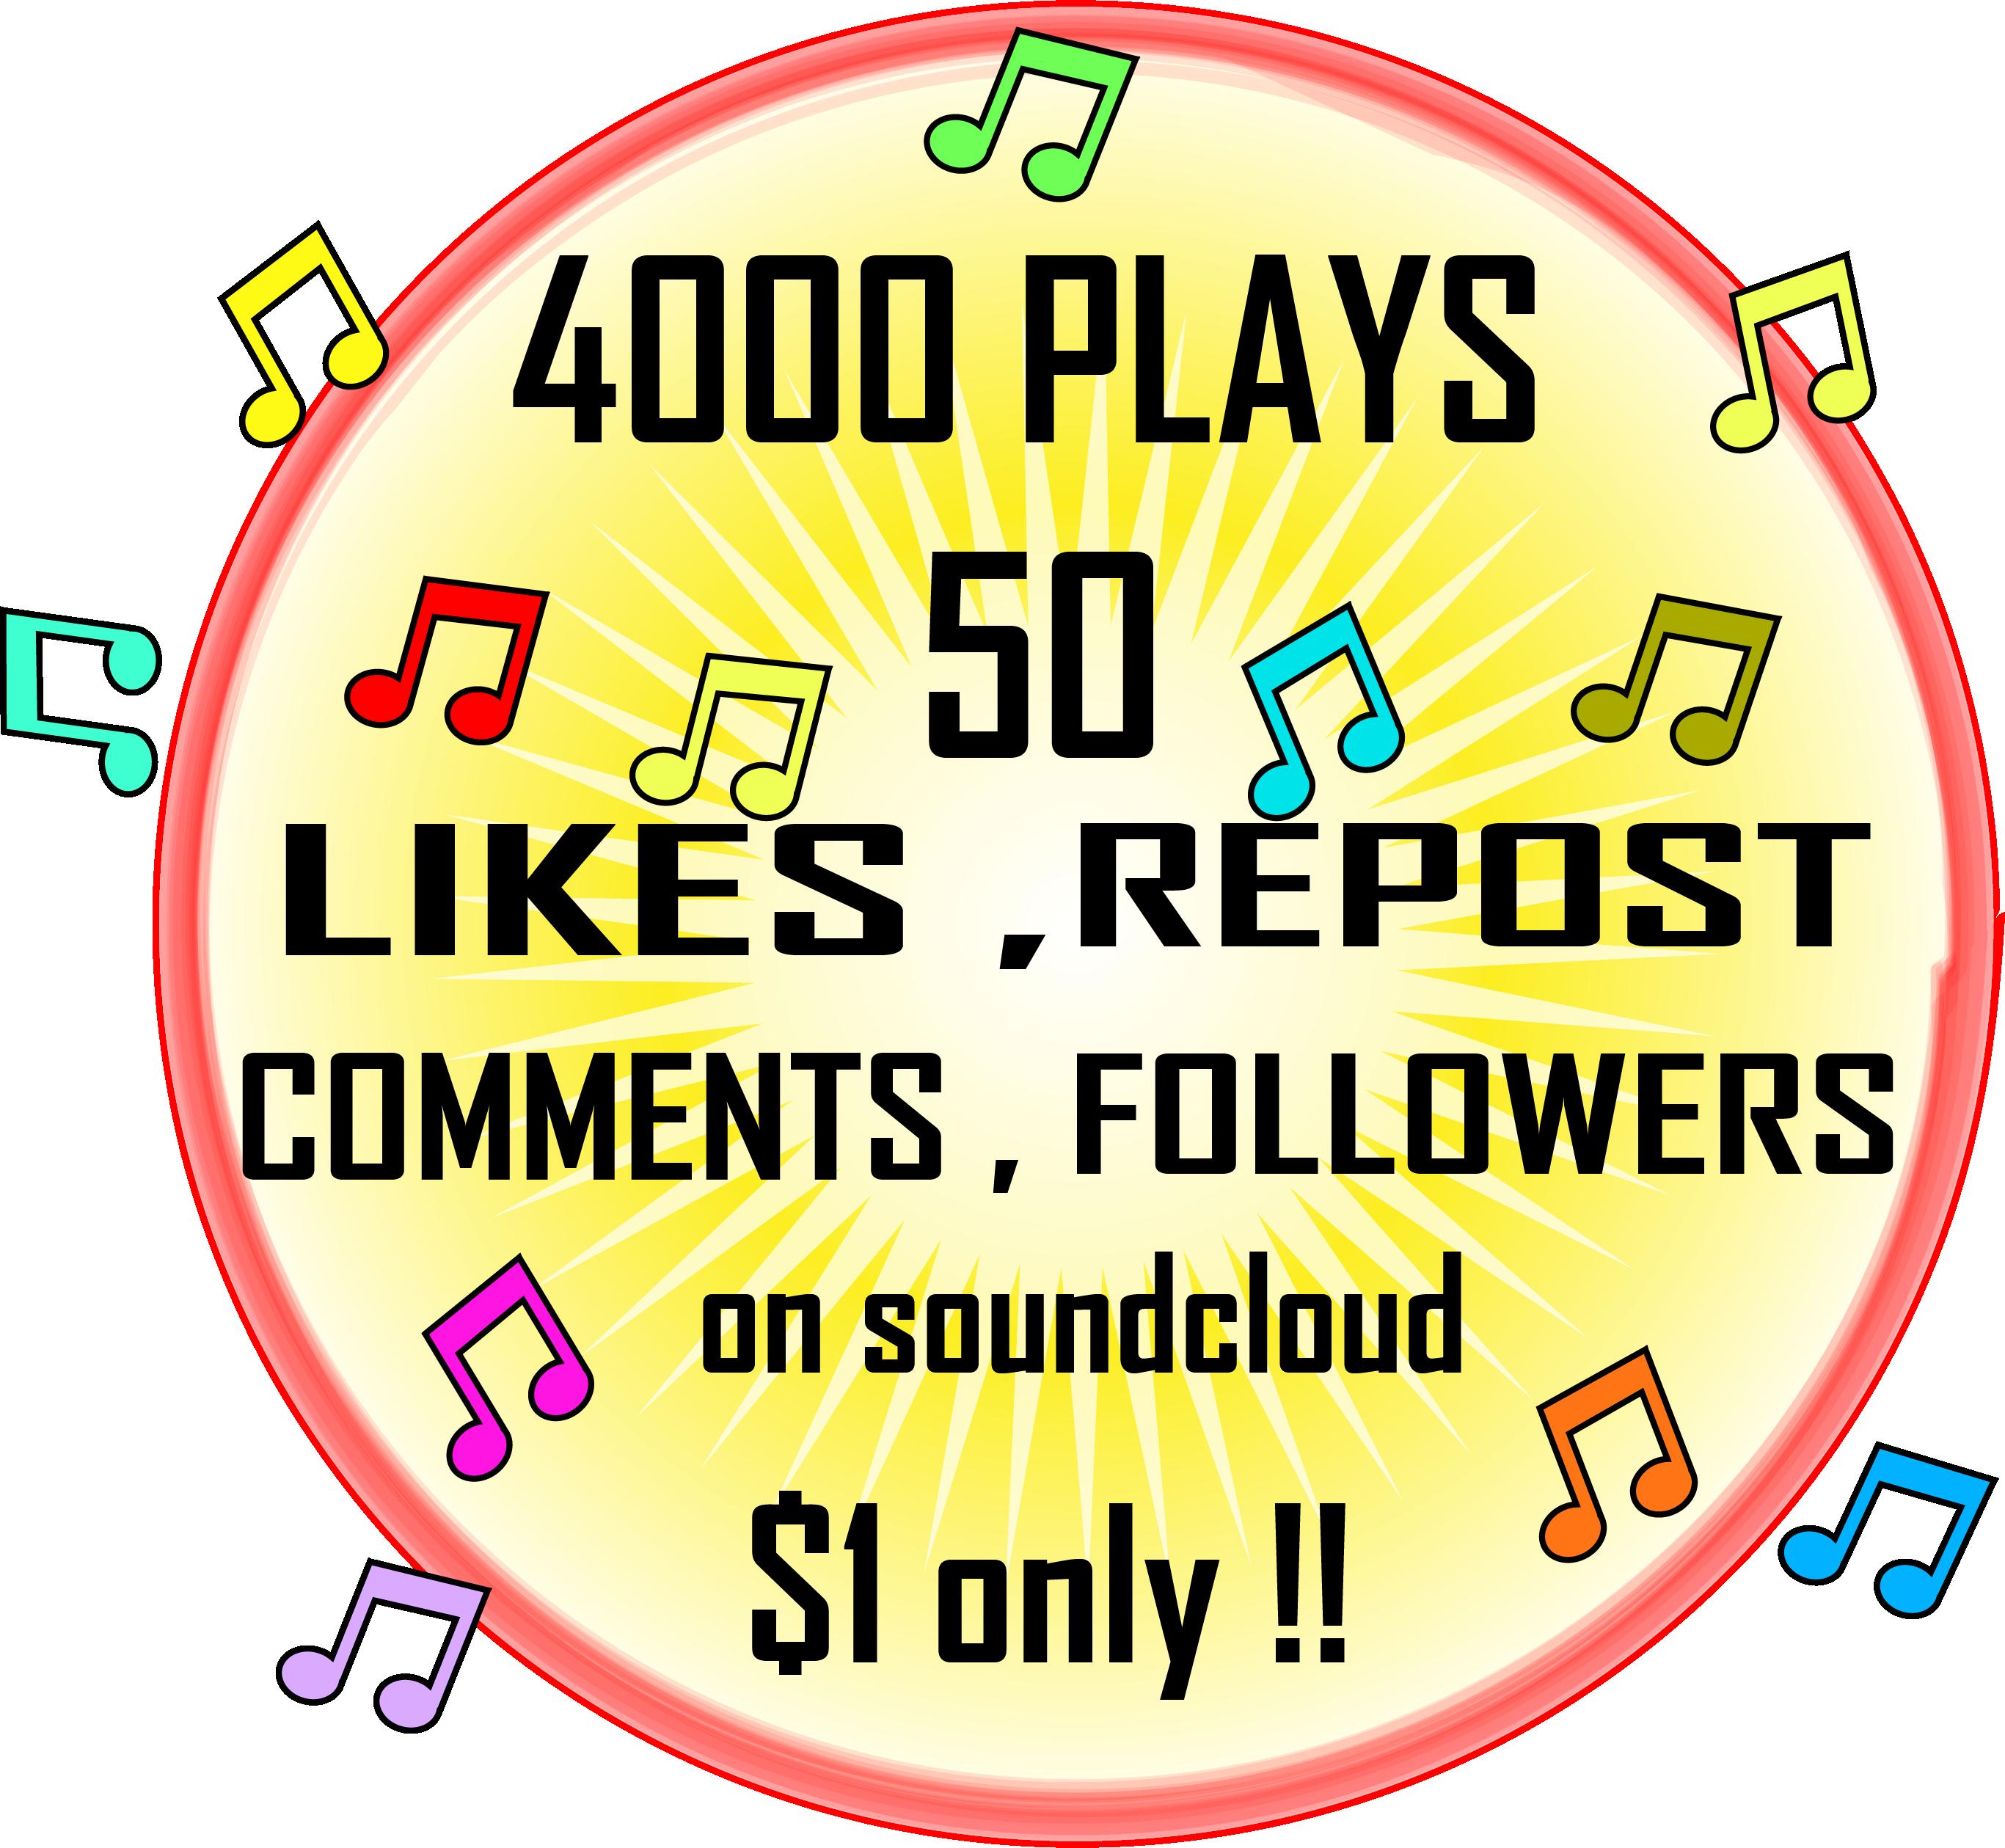 Soundcloud permanent 4k plays 50 Likes + Reposts + Comments + Followers